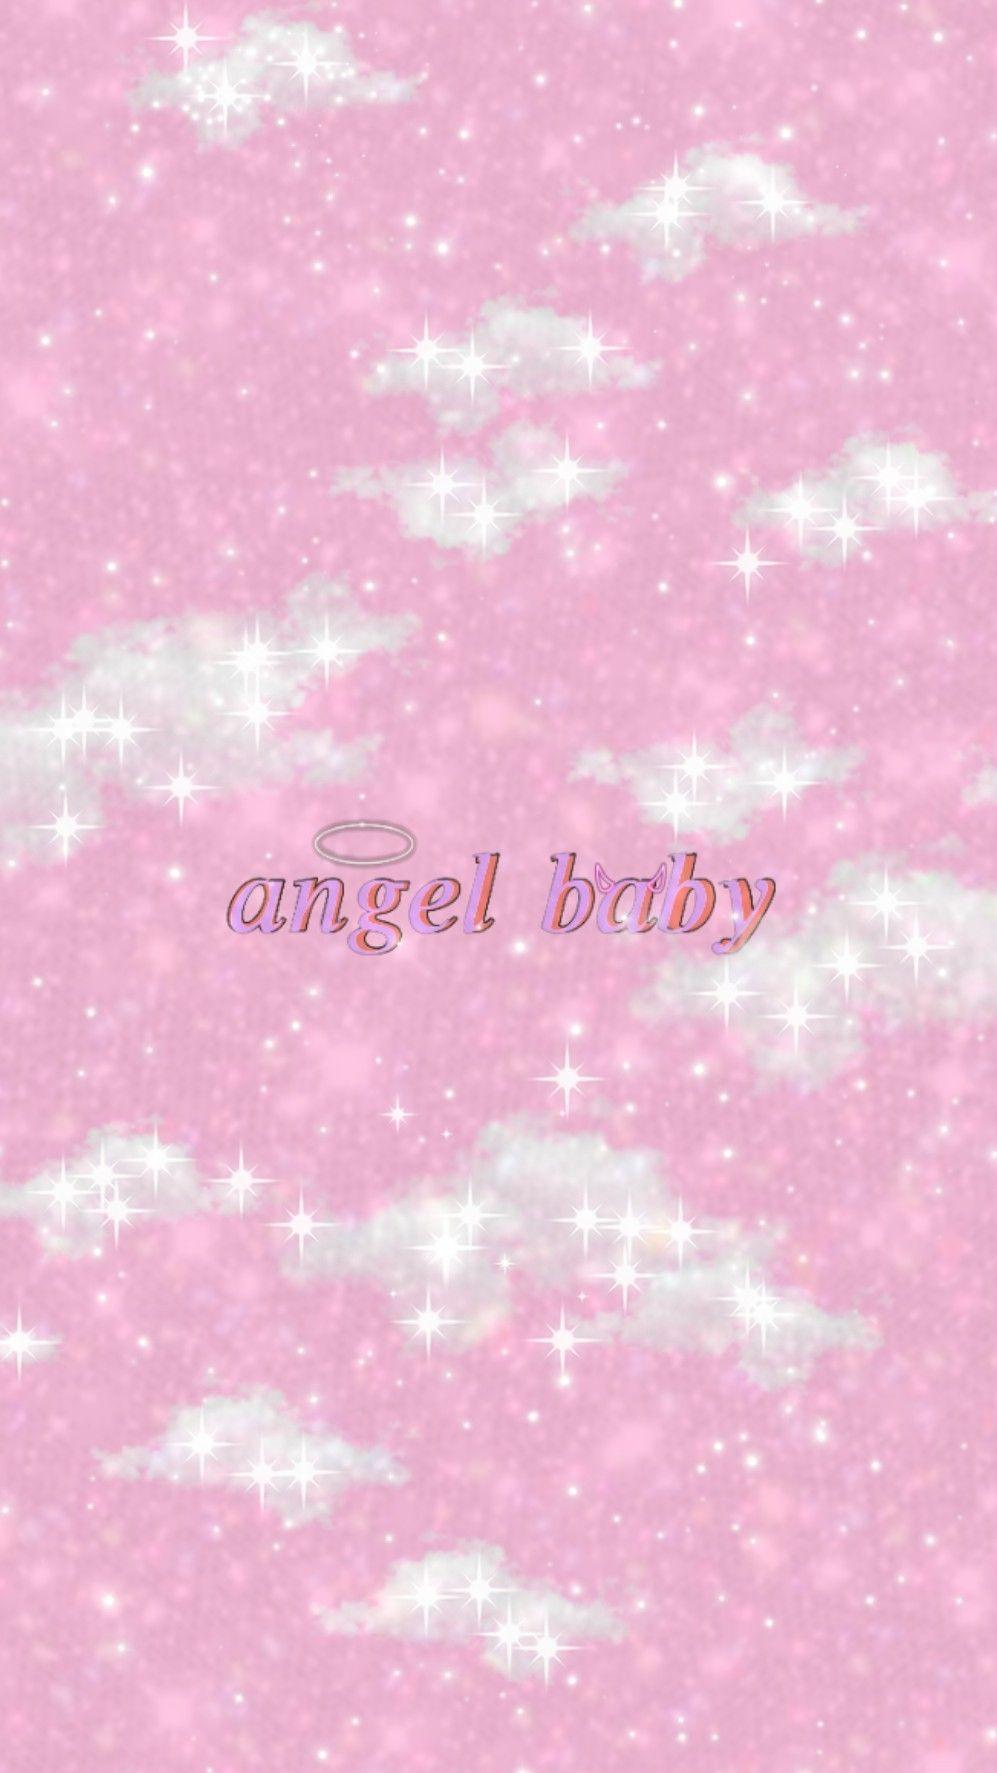 Angel Baby Pink Wallpaper Iphone Pink Wallpaper Backgrounds Iphone Wallpaper Vintage